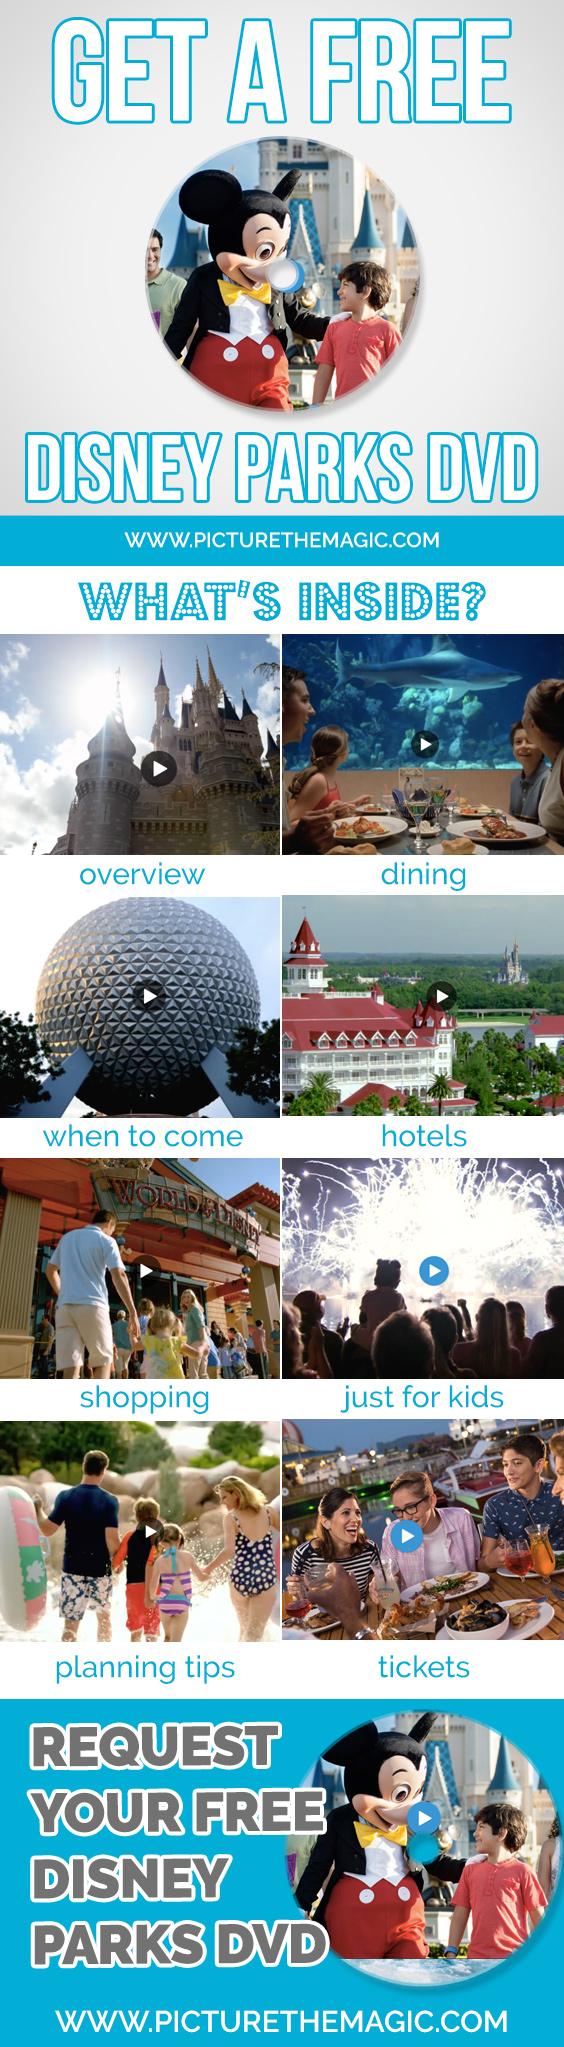 Disney Freebie: Get a free Disney Parks DVD